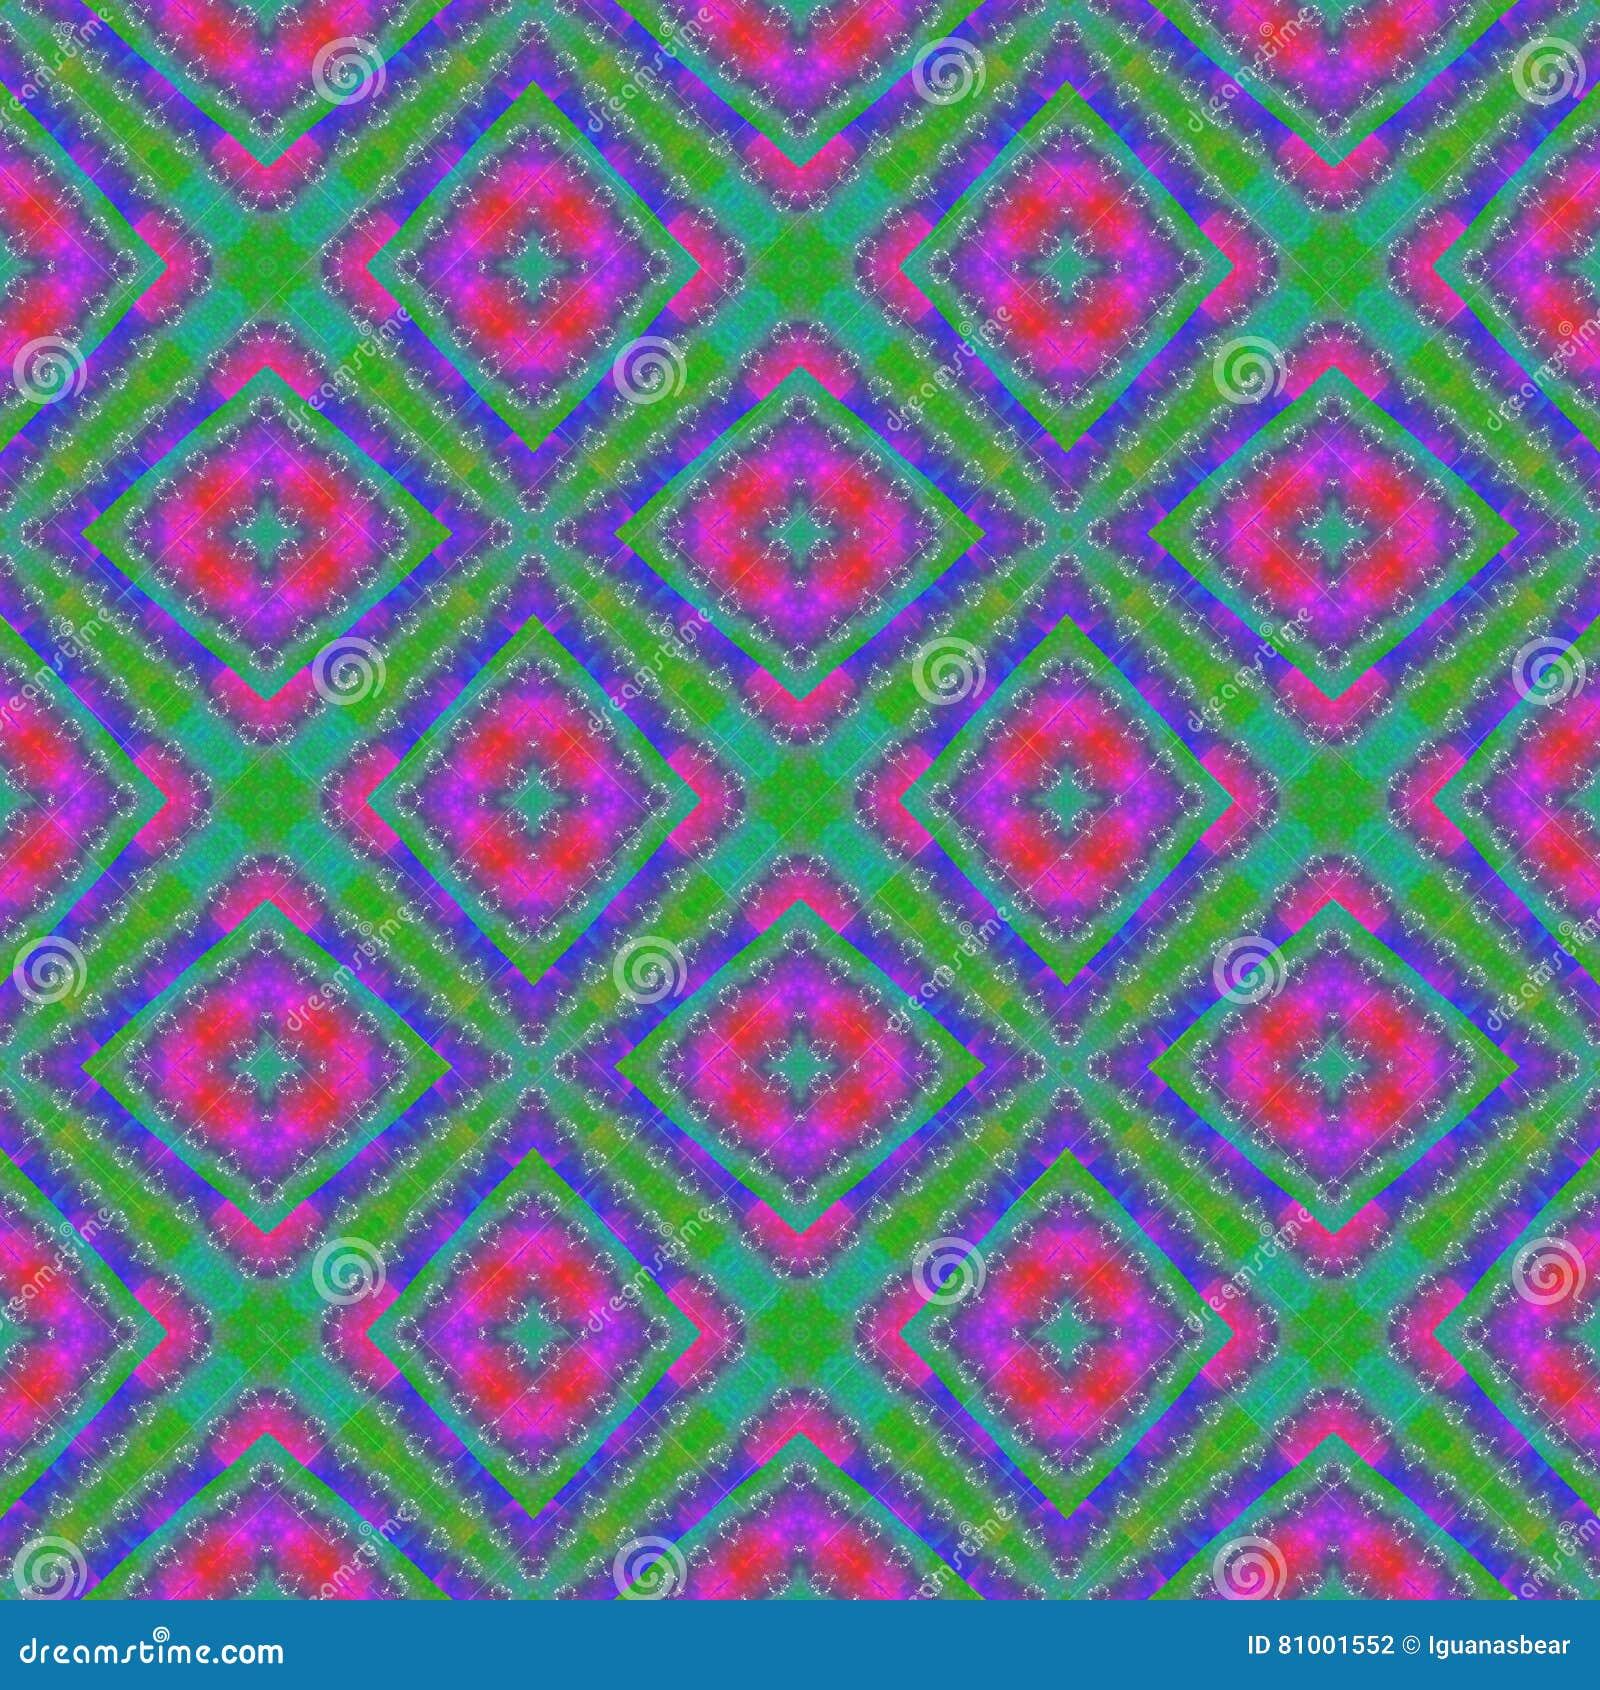 Blue green purple regular lacy seamless pattern